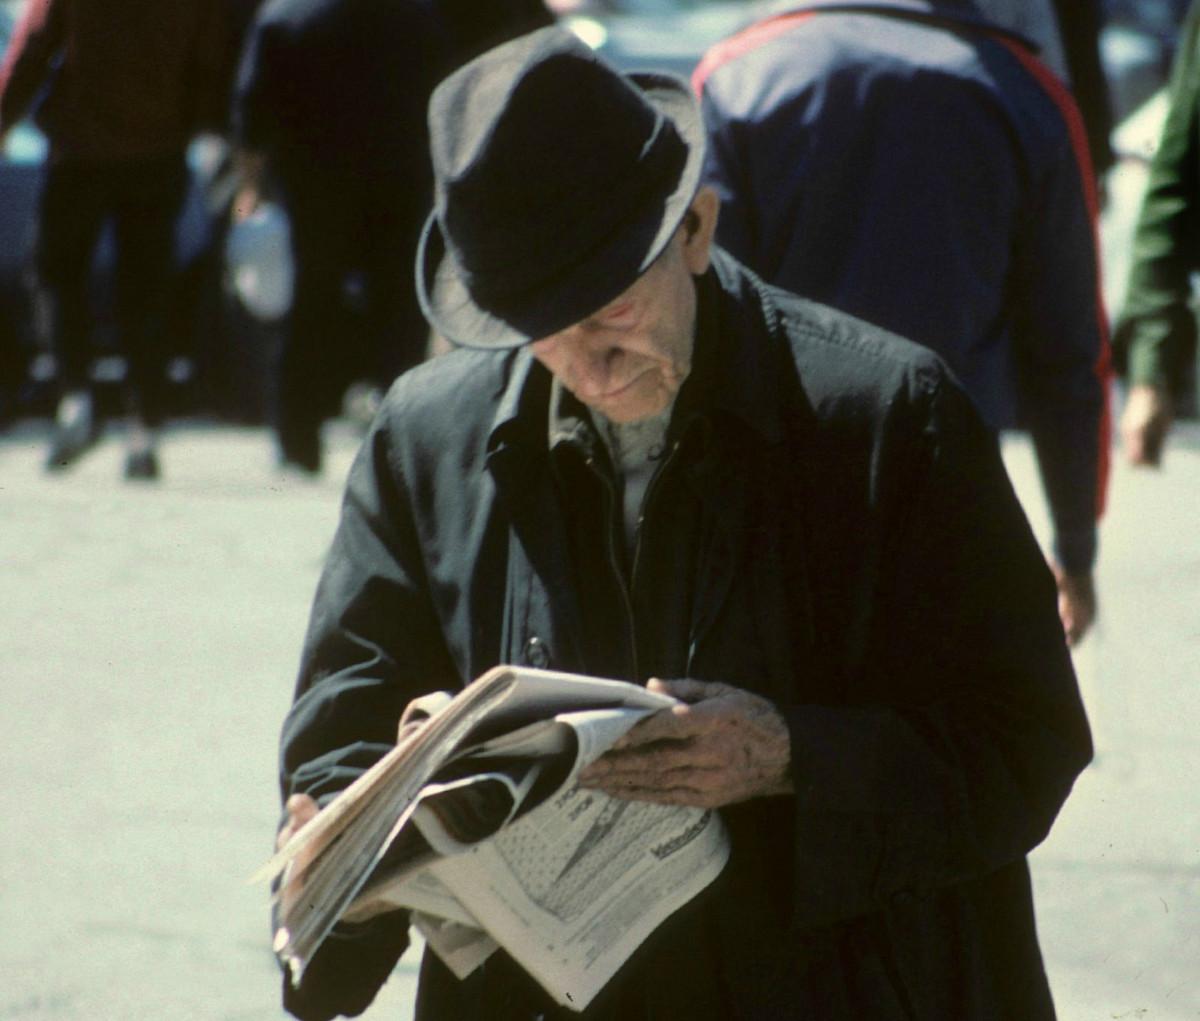 fotograf_steven_siegel_nju_york_1980-30